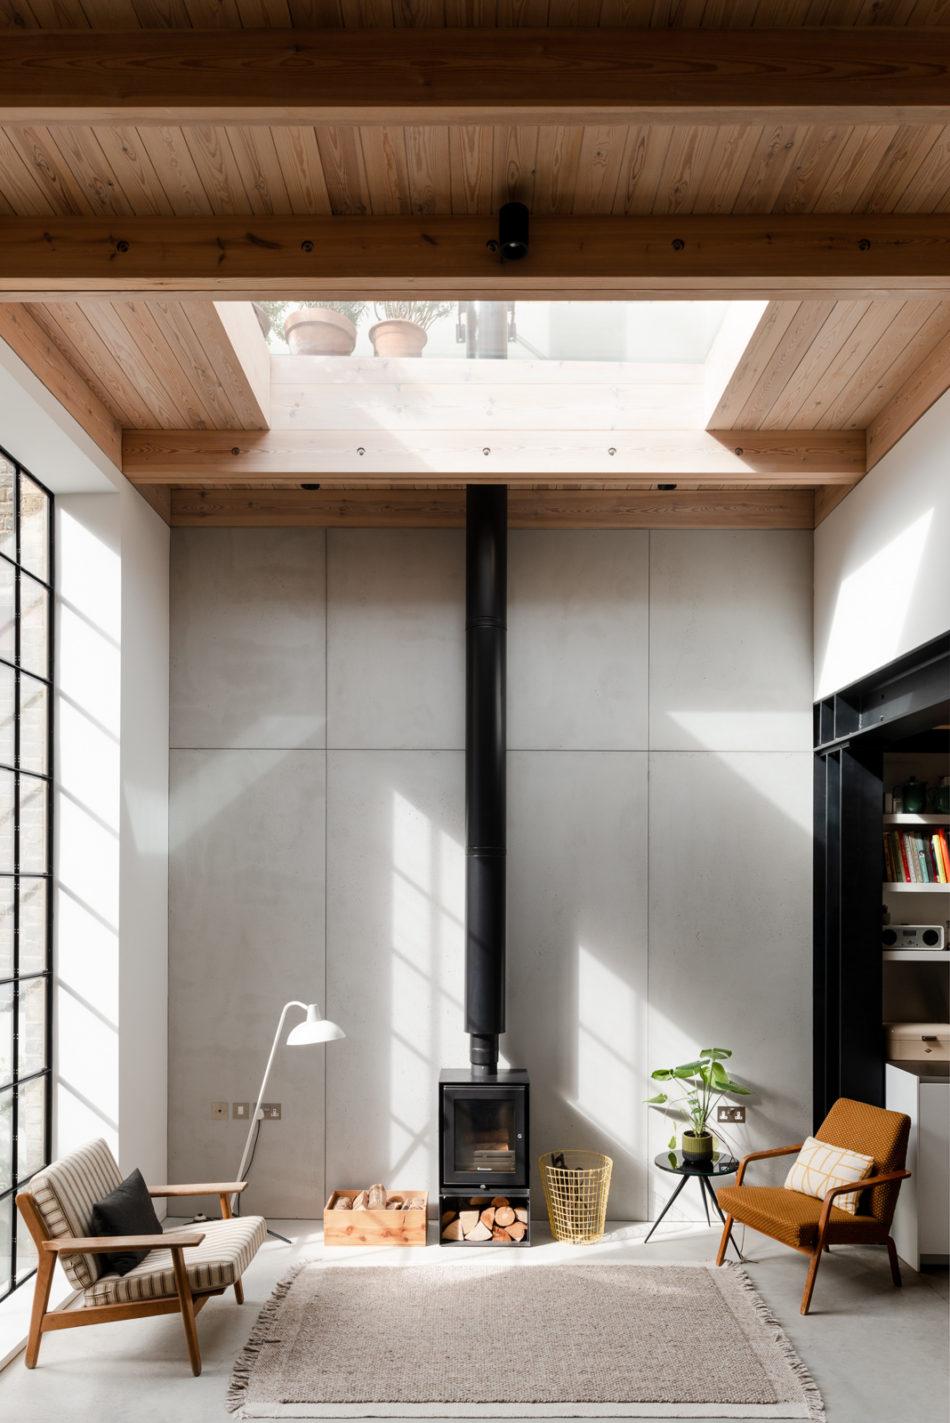 What makes a modern house